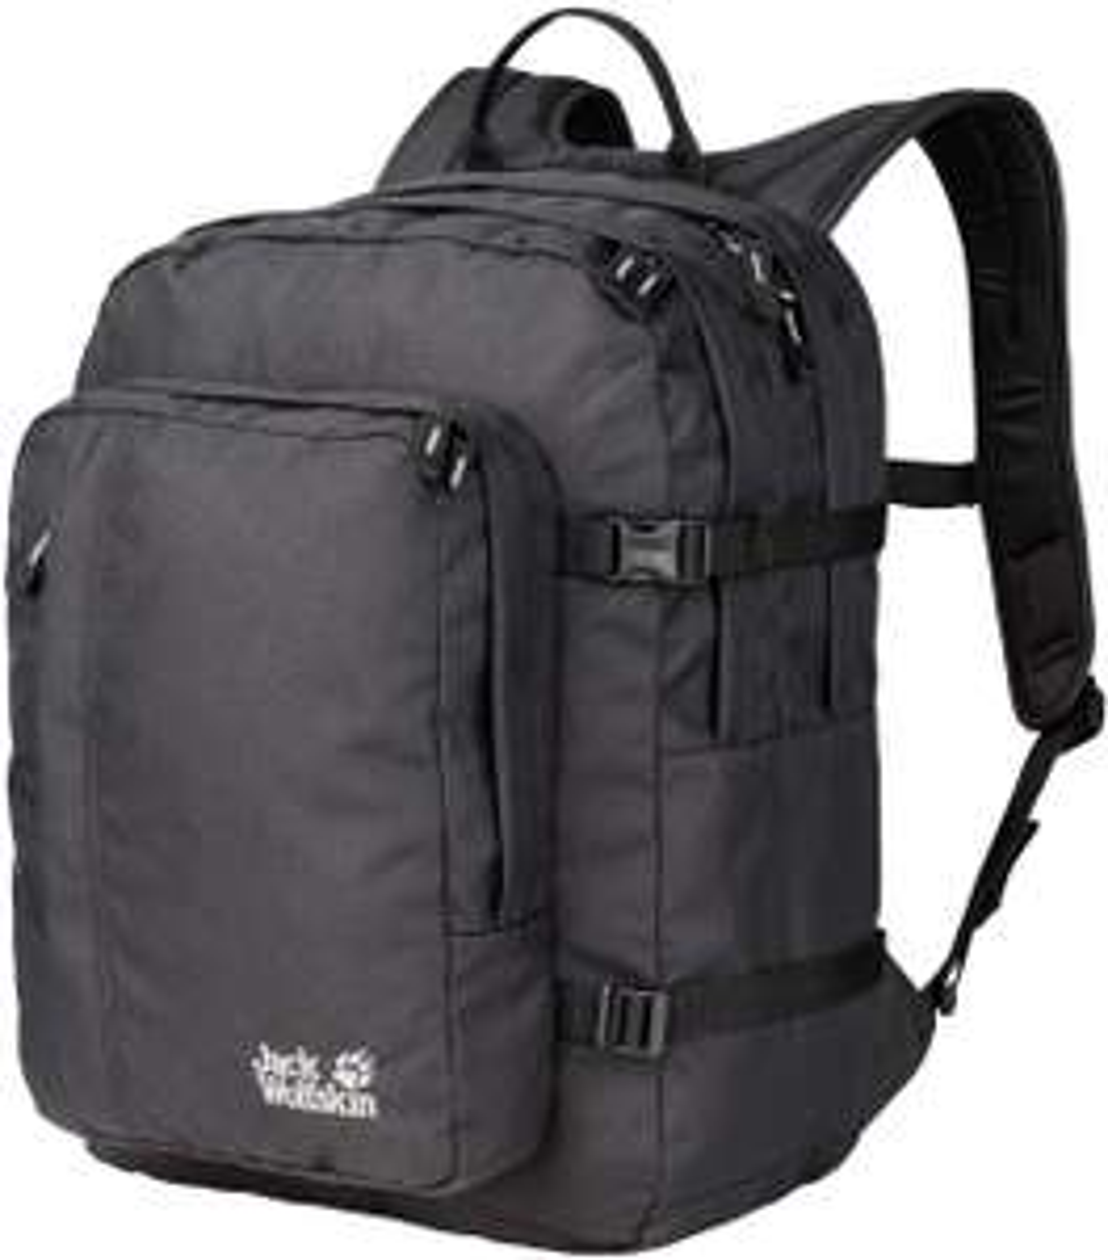 Jack Wolfskin Berkeley Backpack in Black or Ebony £25 at Amazon